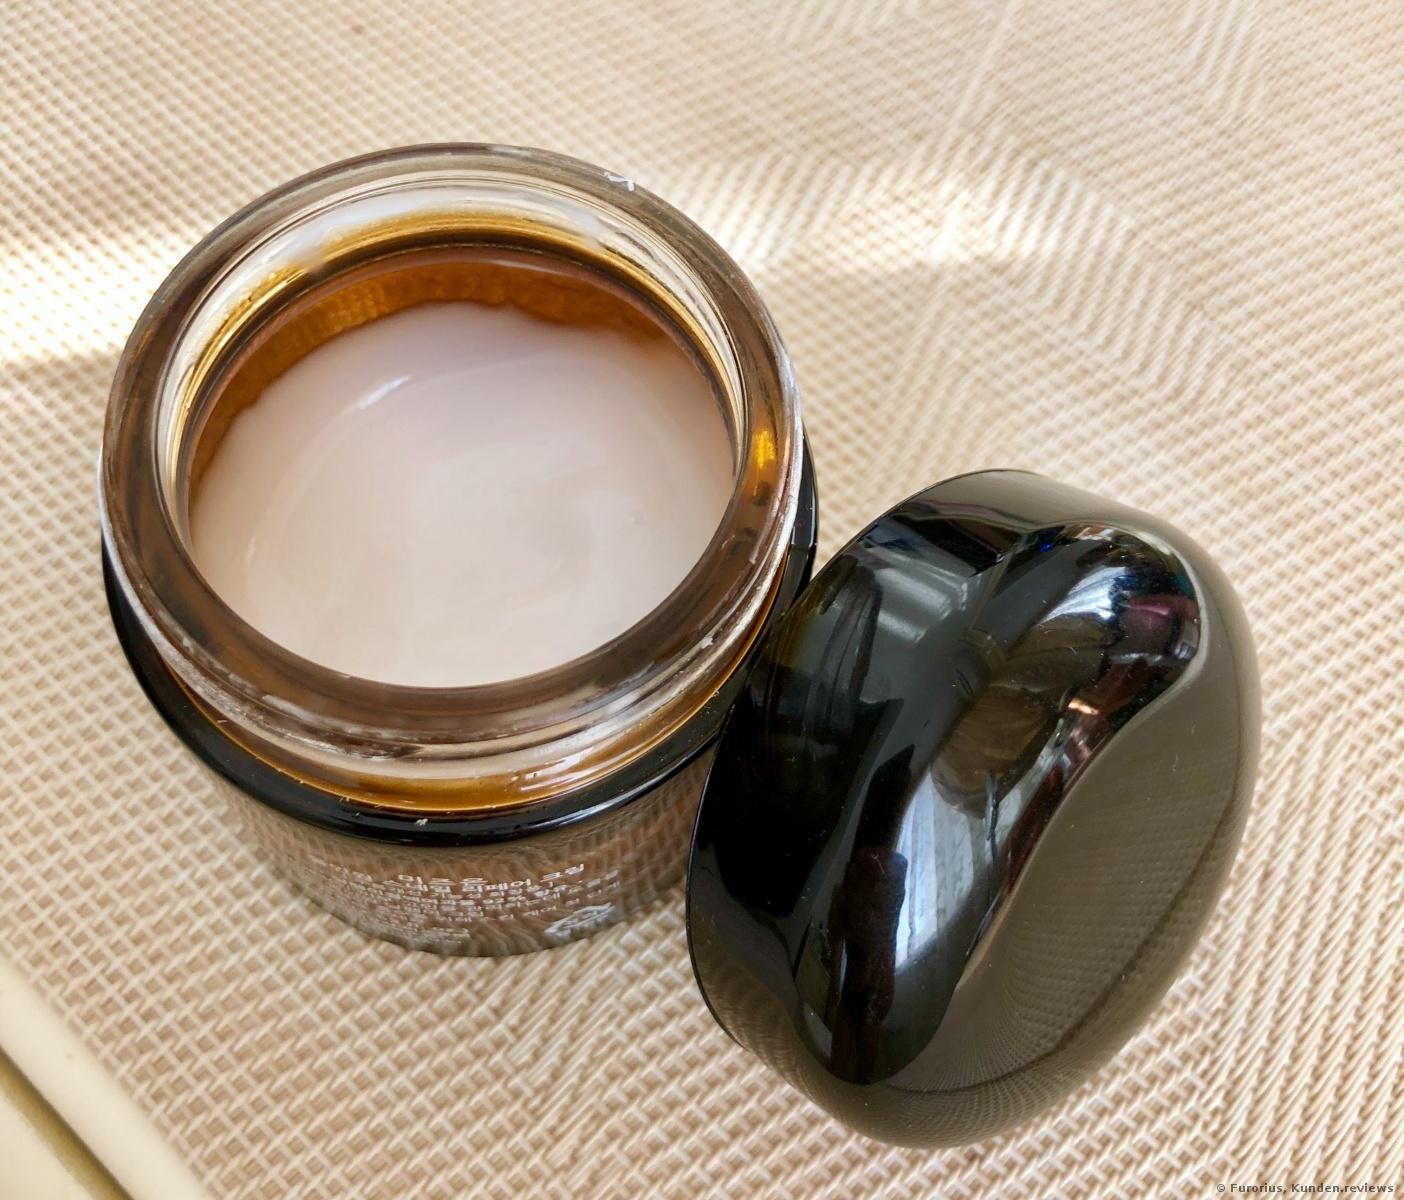 Mizon Creme All in One Snail Repair Cream